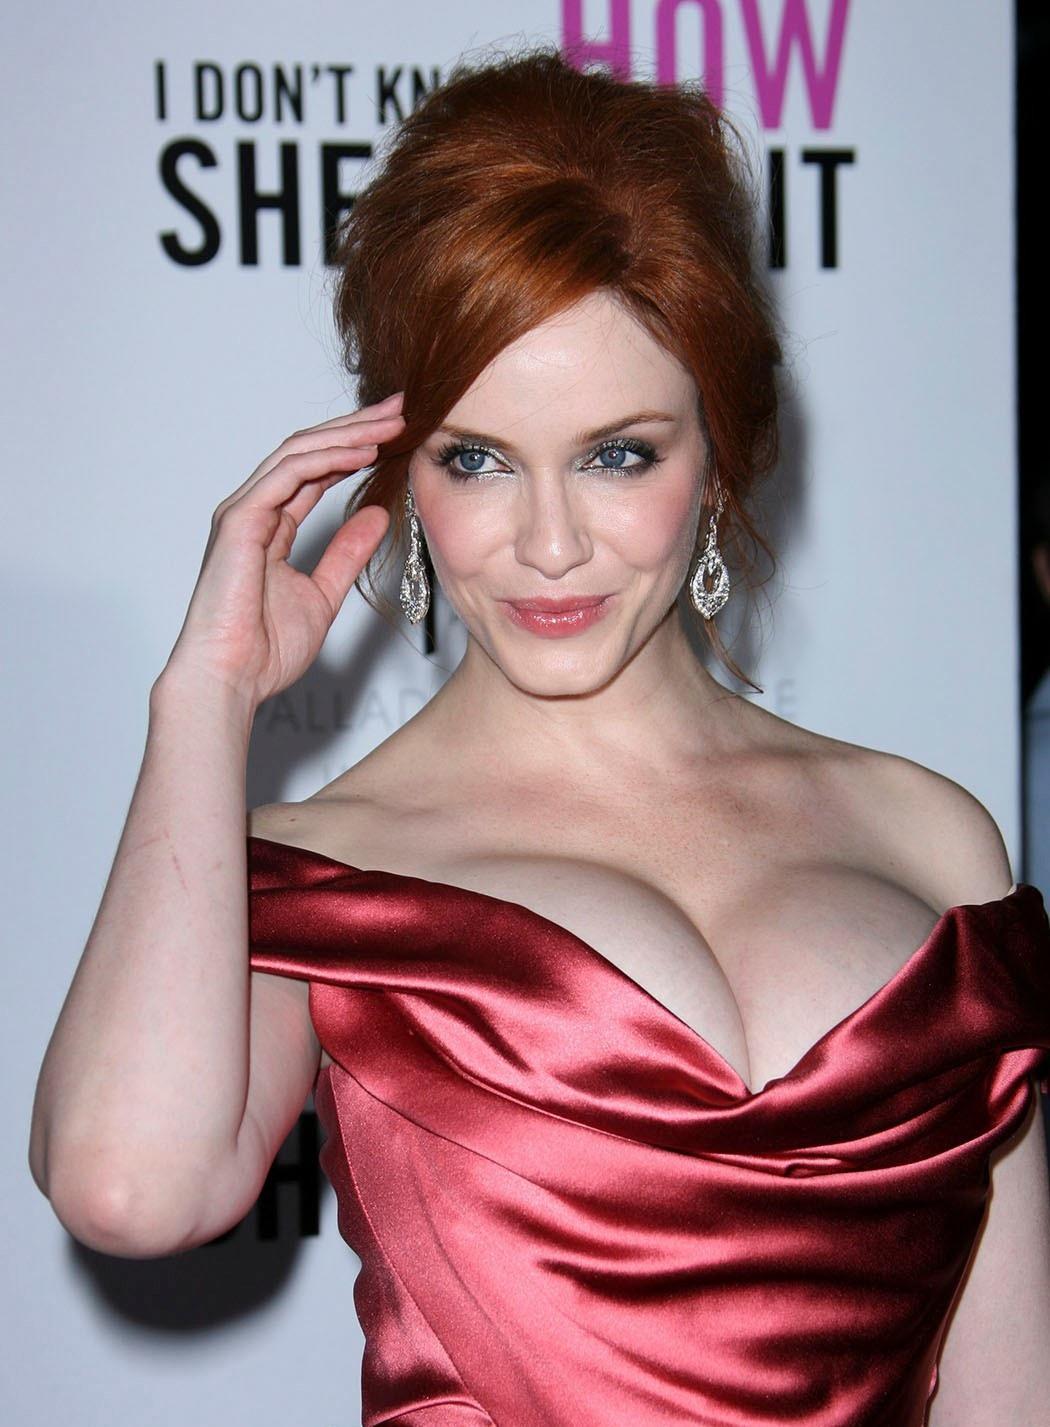 christina-hendricks-boobs-size